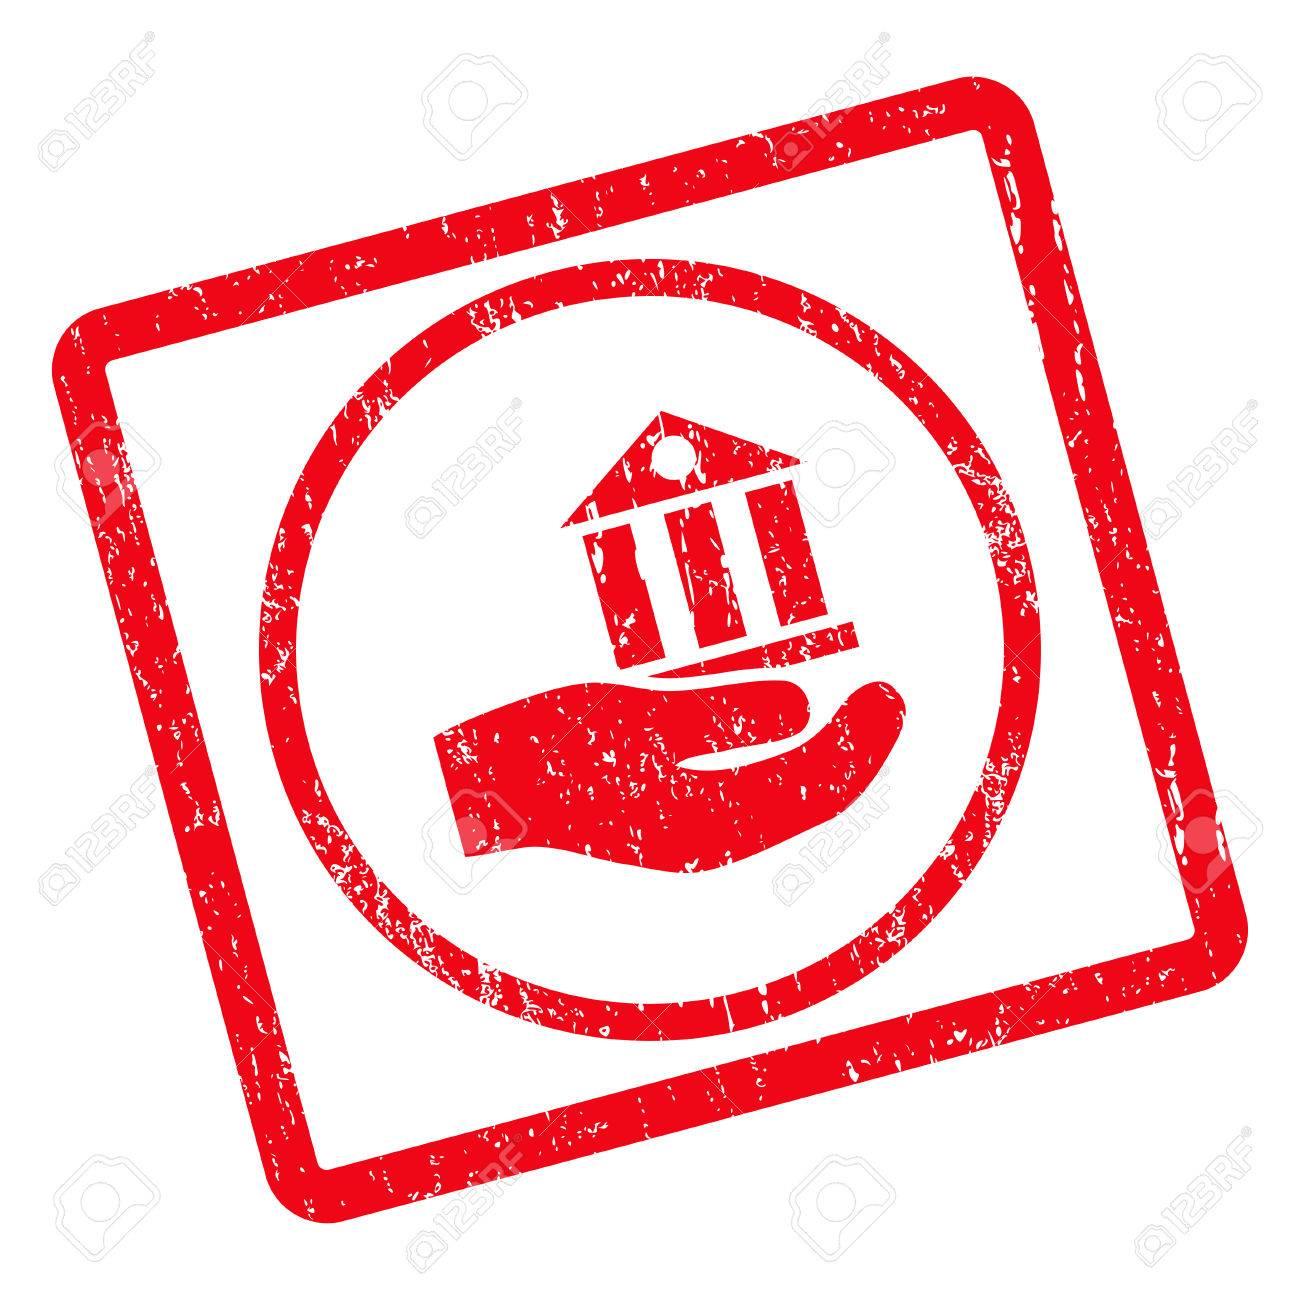 Design Bank Wit.Bank Service Rubber Seal Stamp Watermark Glyph Pictogram Symbol